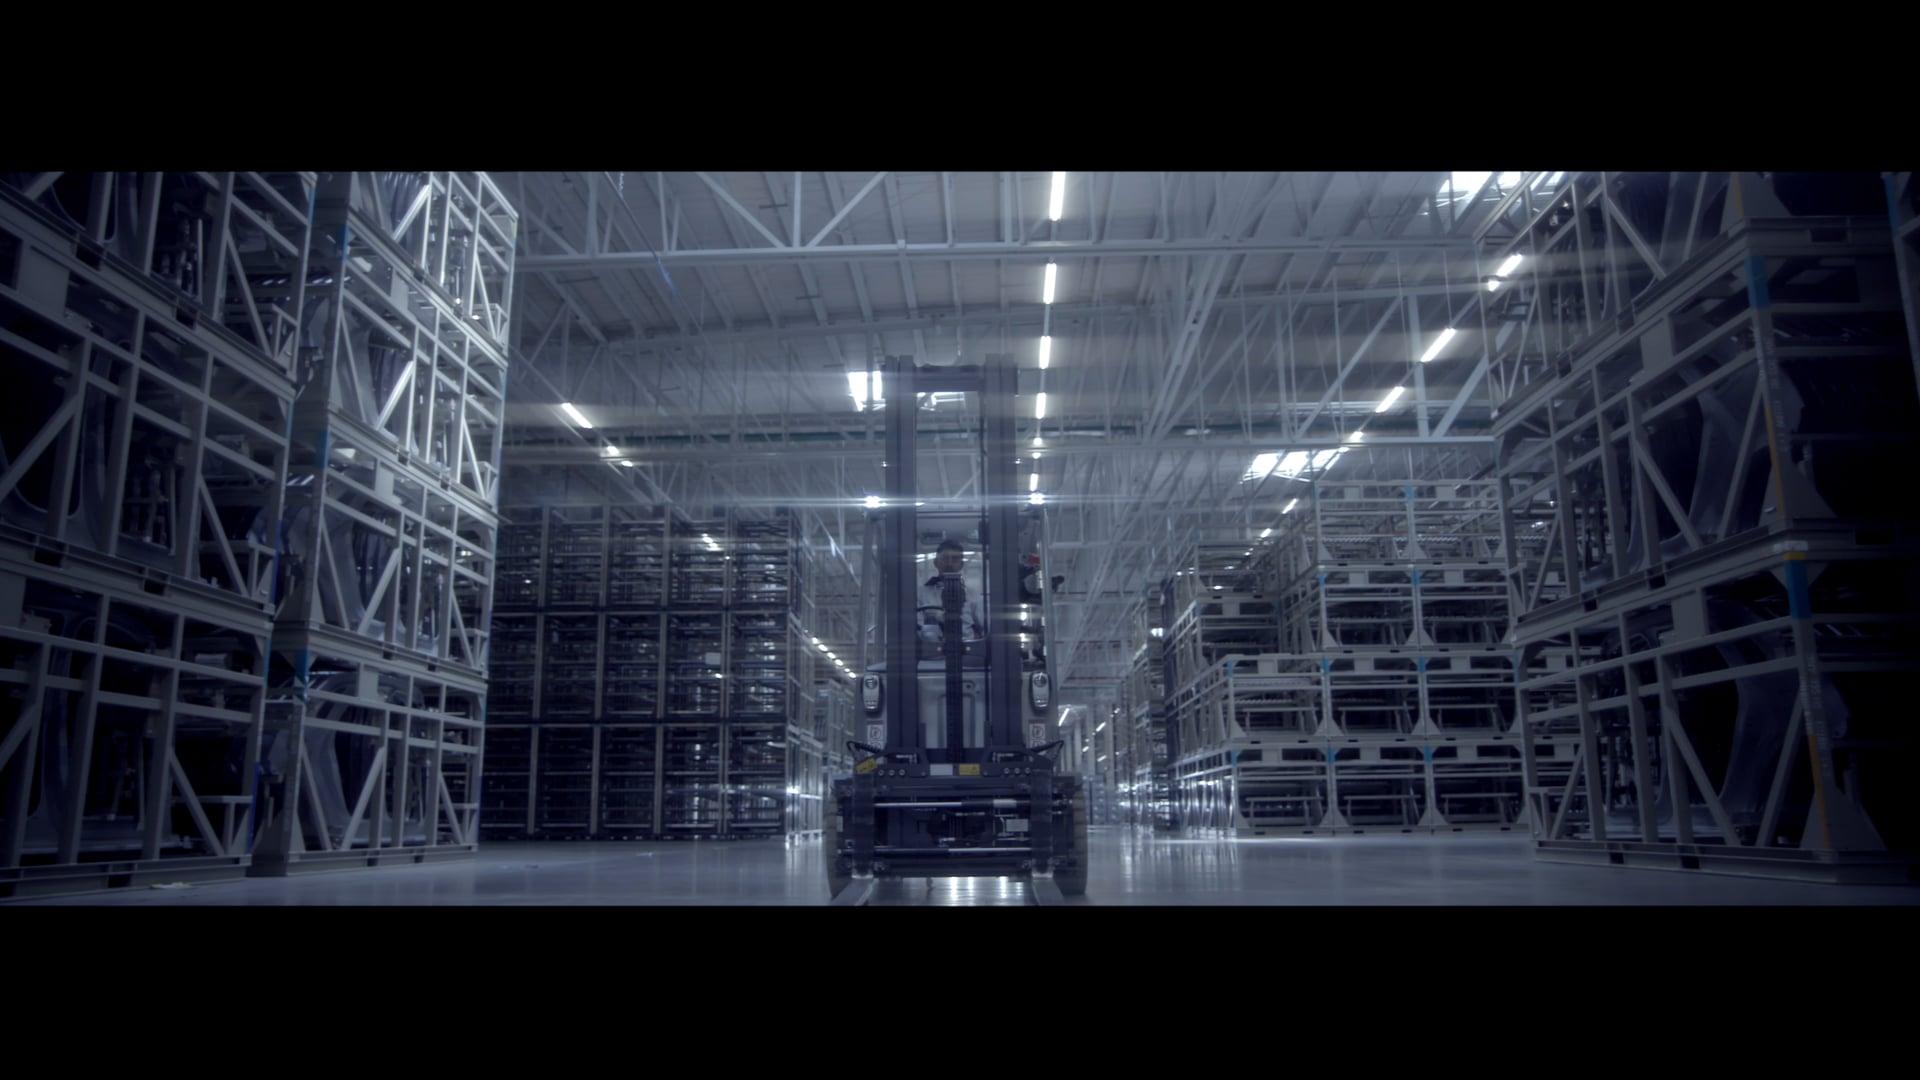 Audi - Pasion (Director's Cut)